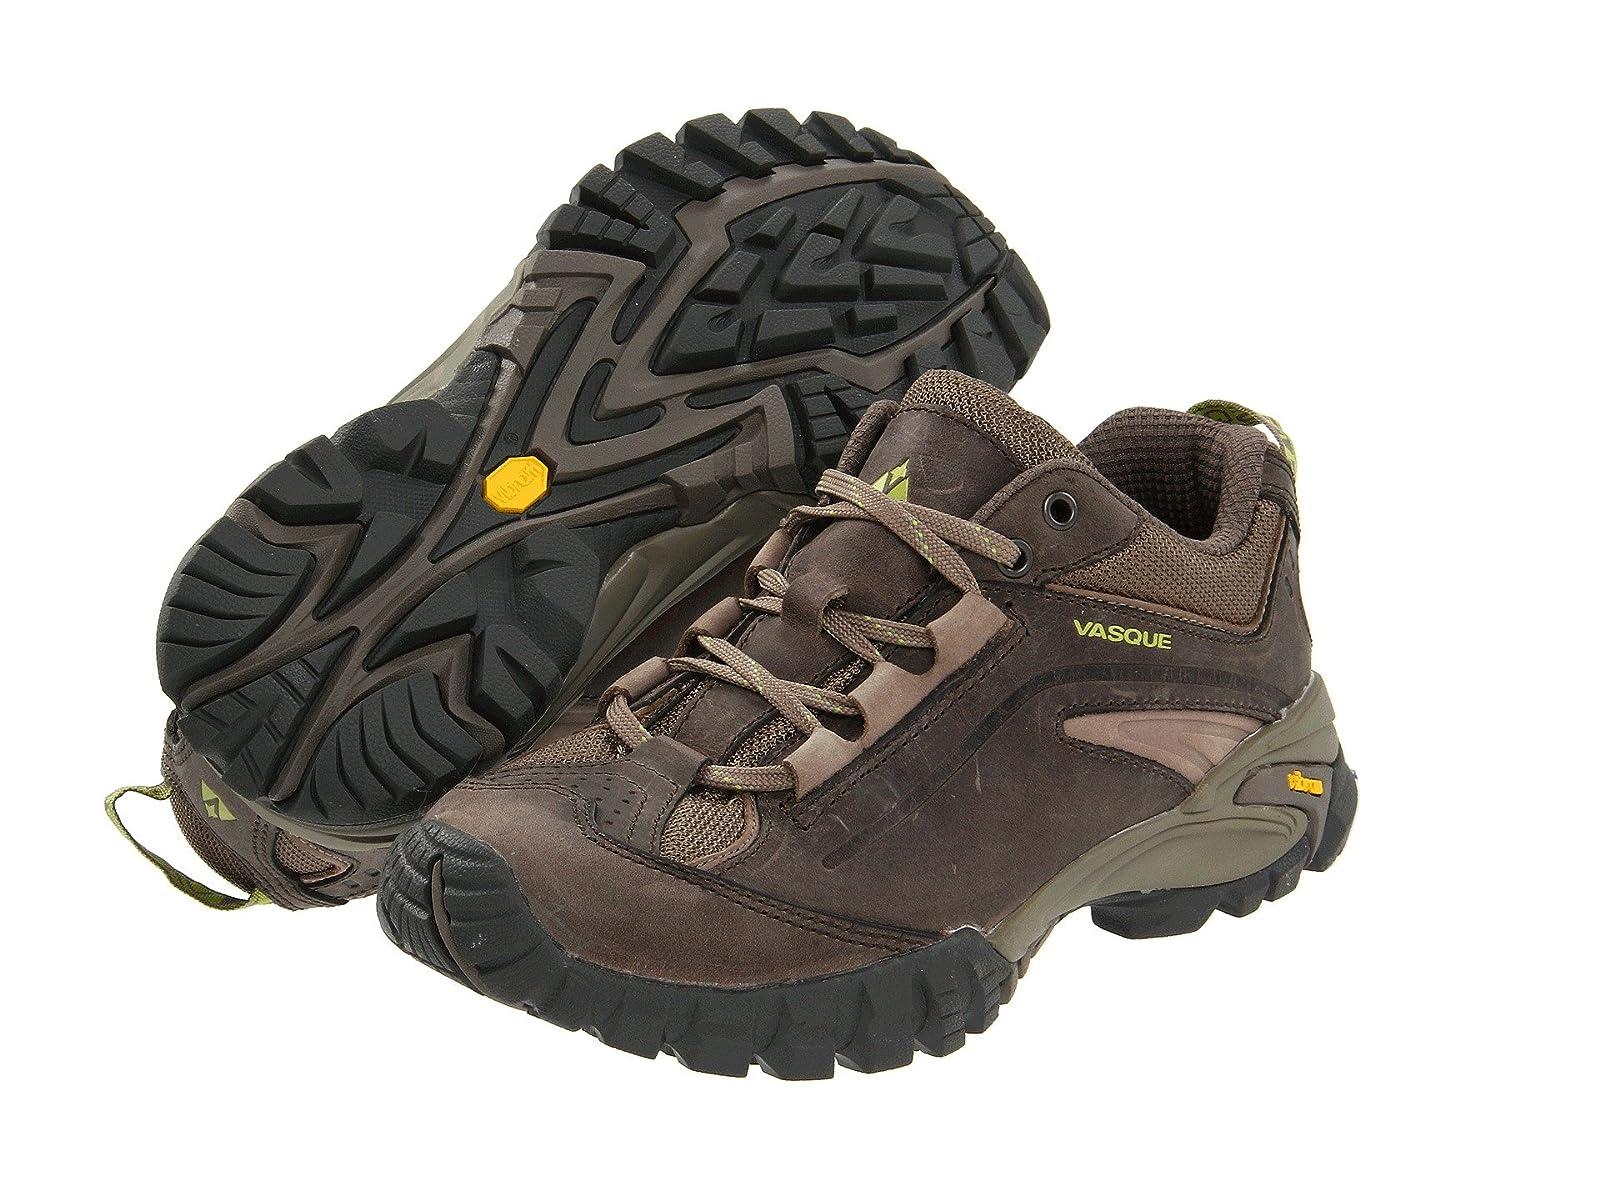 Vasque Mantra 2.0Atmospheric grades have affordable shoes